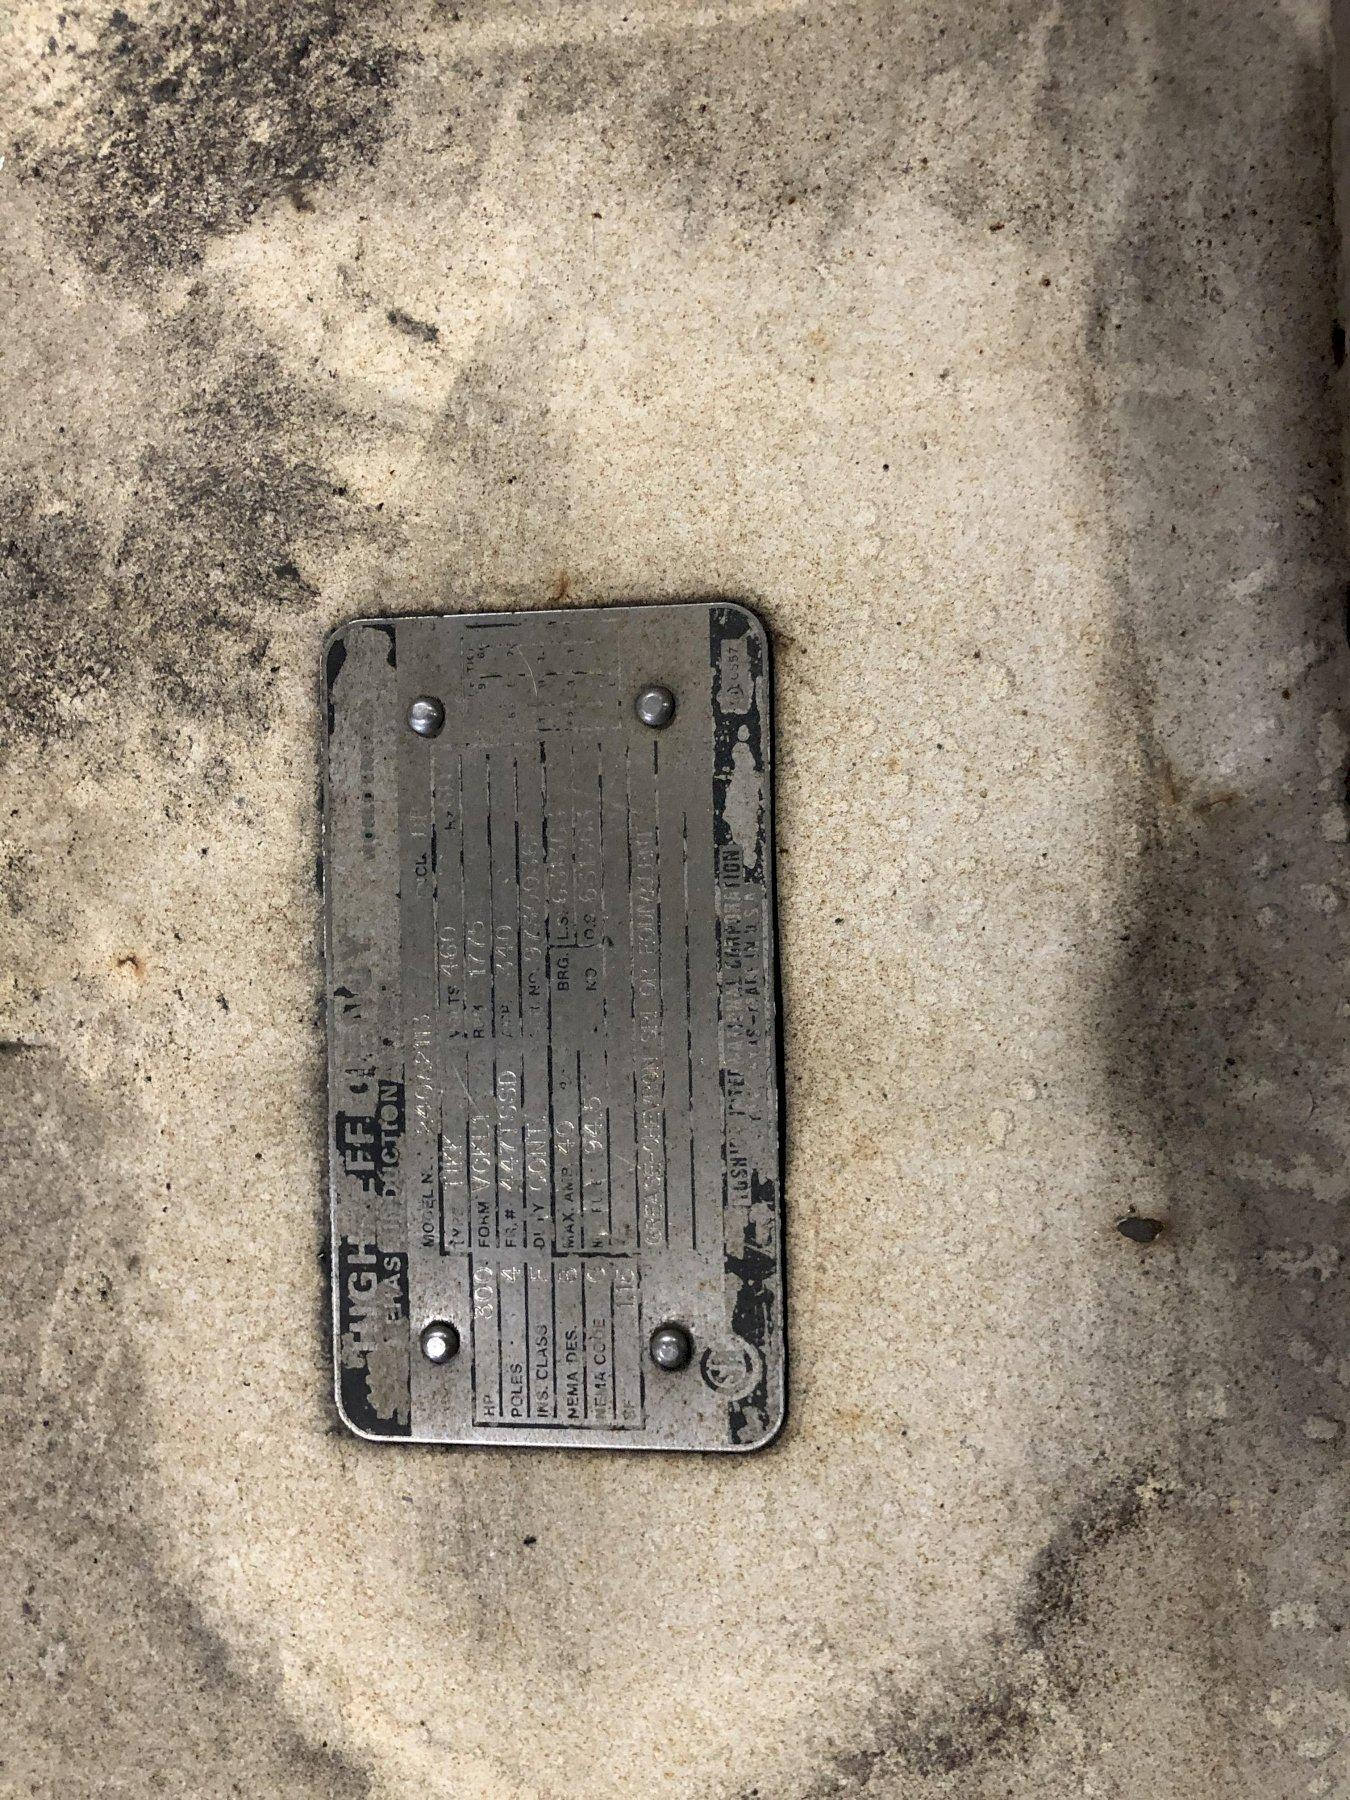 GARDNER DENVER  MODEL EAU99G 300HP SCREW TYPE AIR COMPRESSOR S/N S005622 NOT IN SERVICE